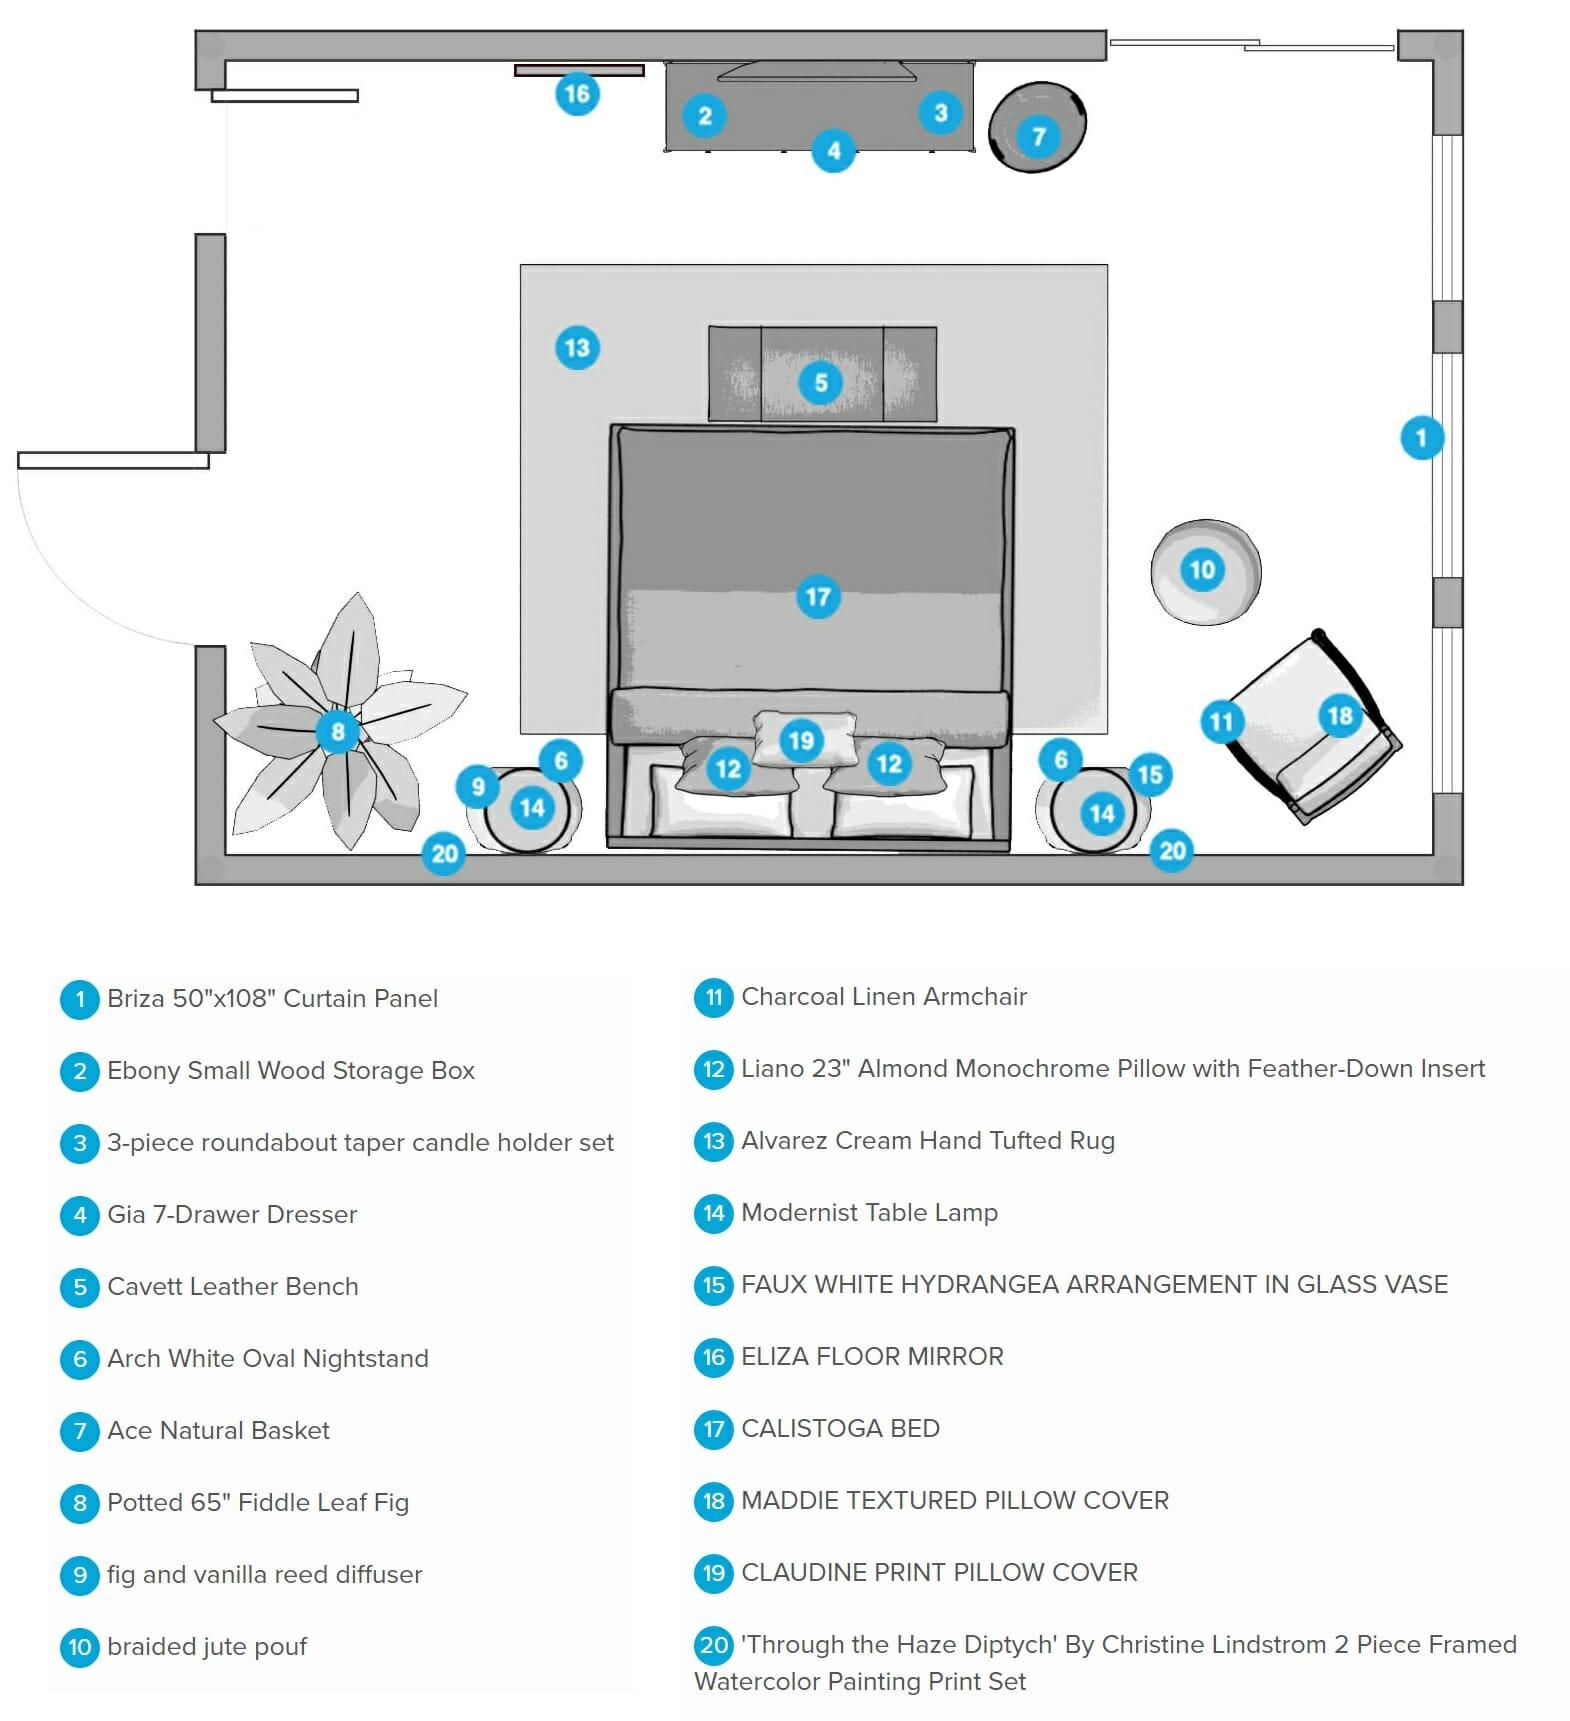 decorilla vs decorist comparison floor plan